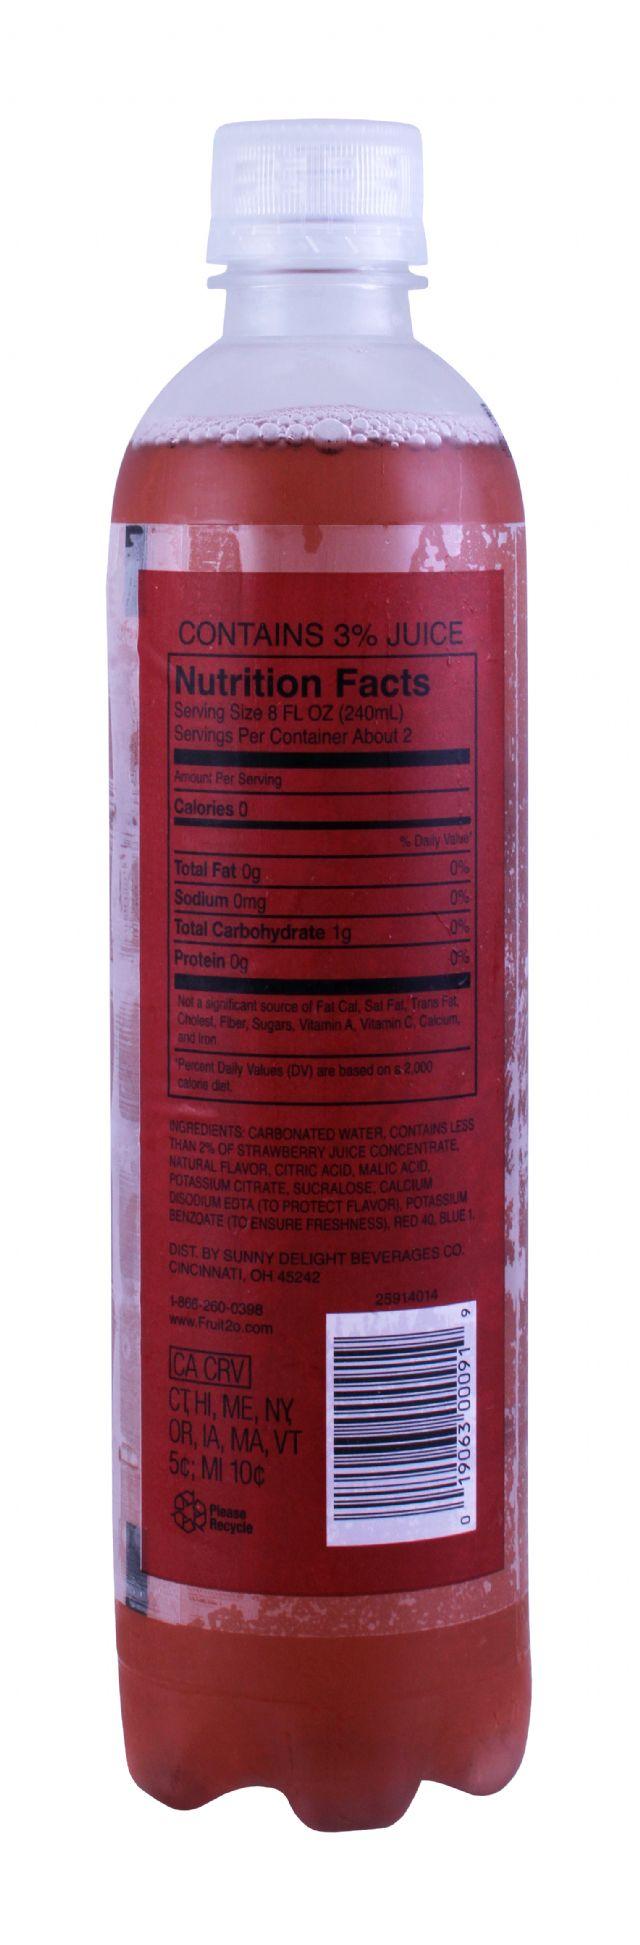 Sparkling Fruit2O: Fruit20 MixedBerry Facts